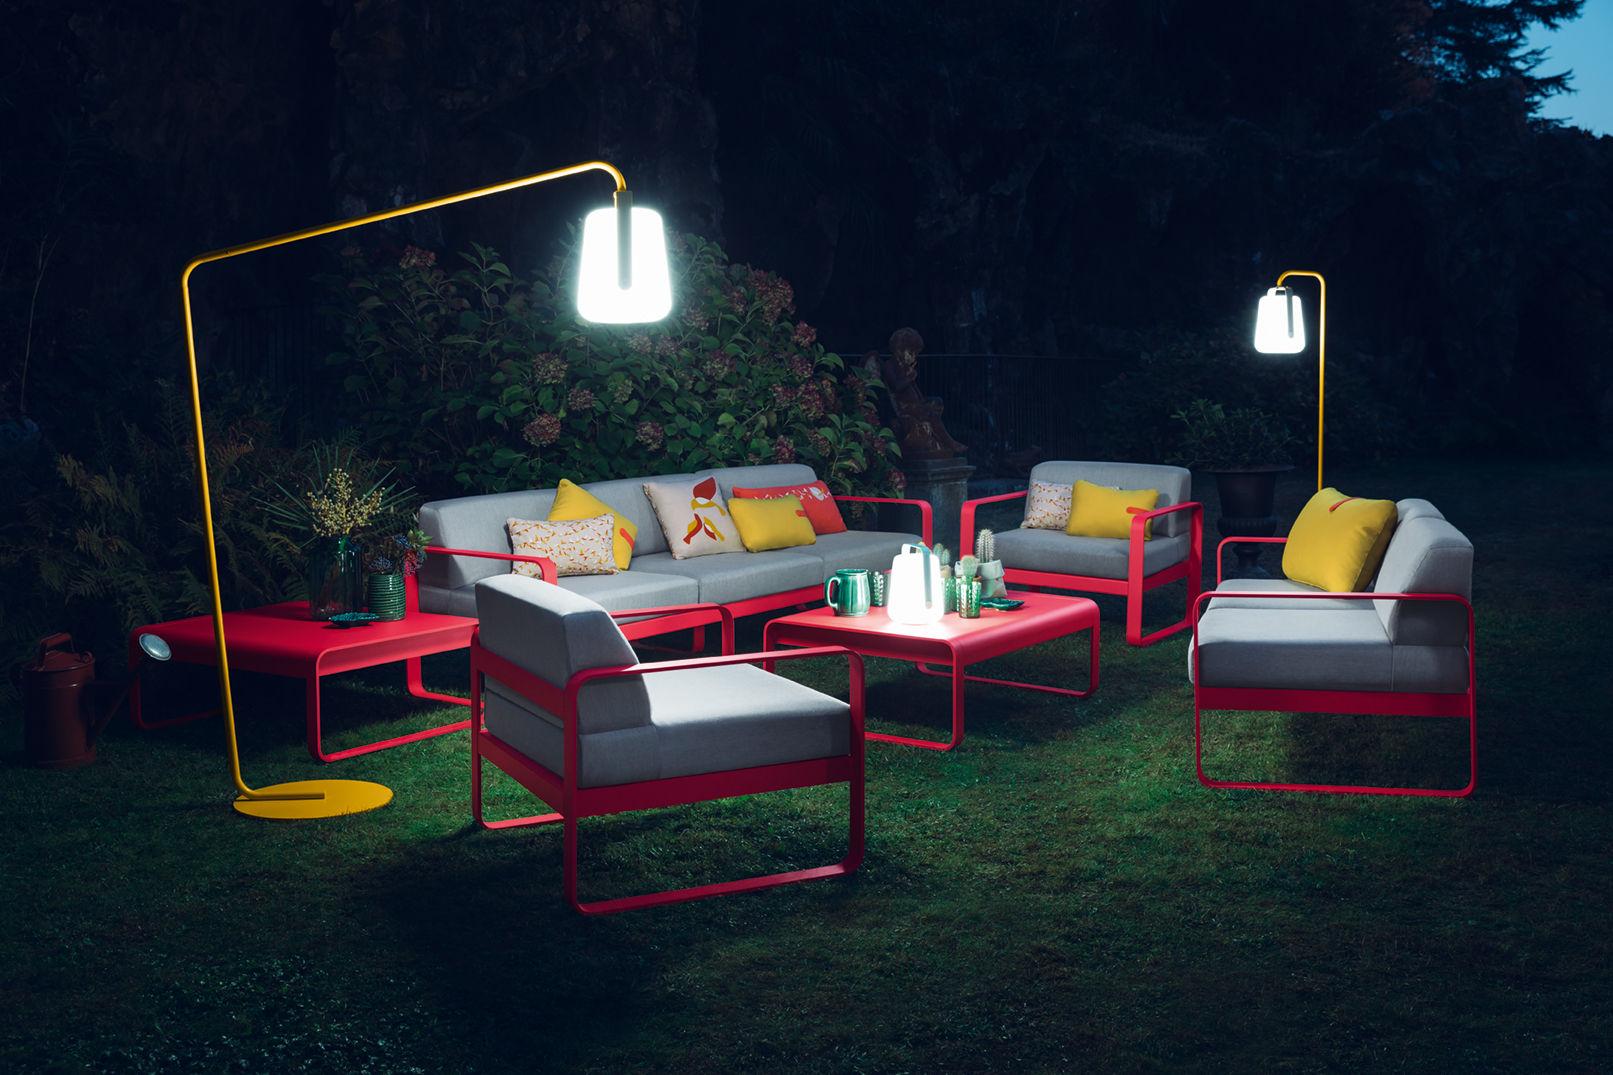 Lampe Ohne Kabel Balad Small LED Von Fermob - Rosa